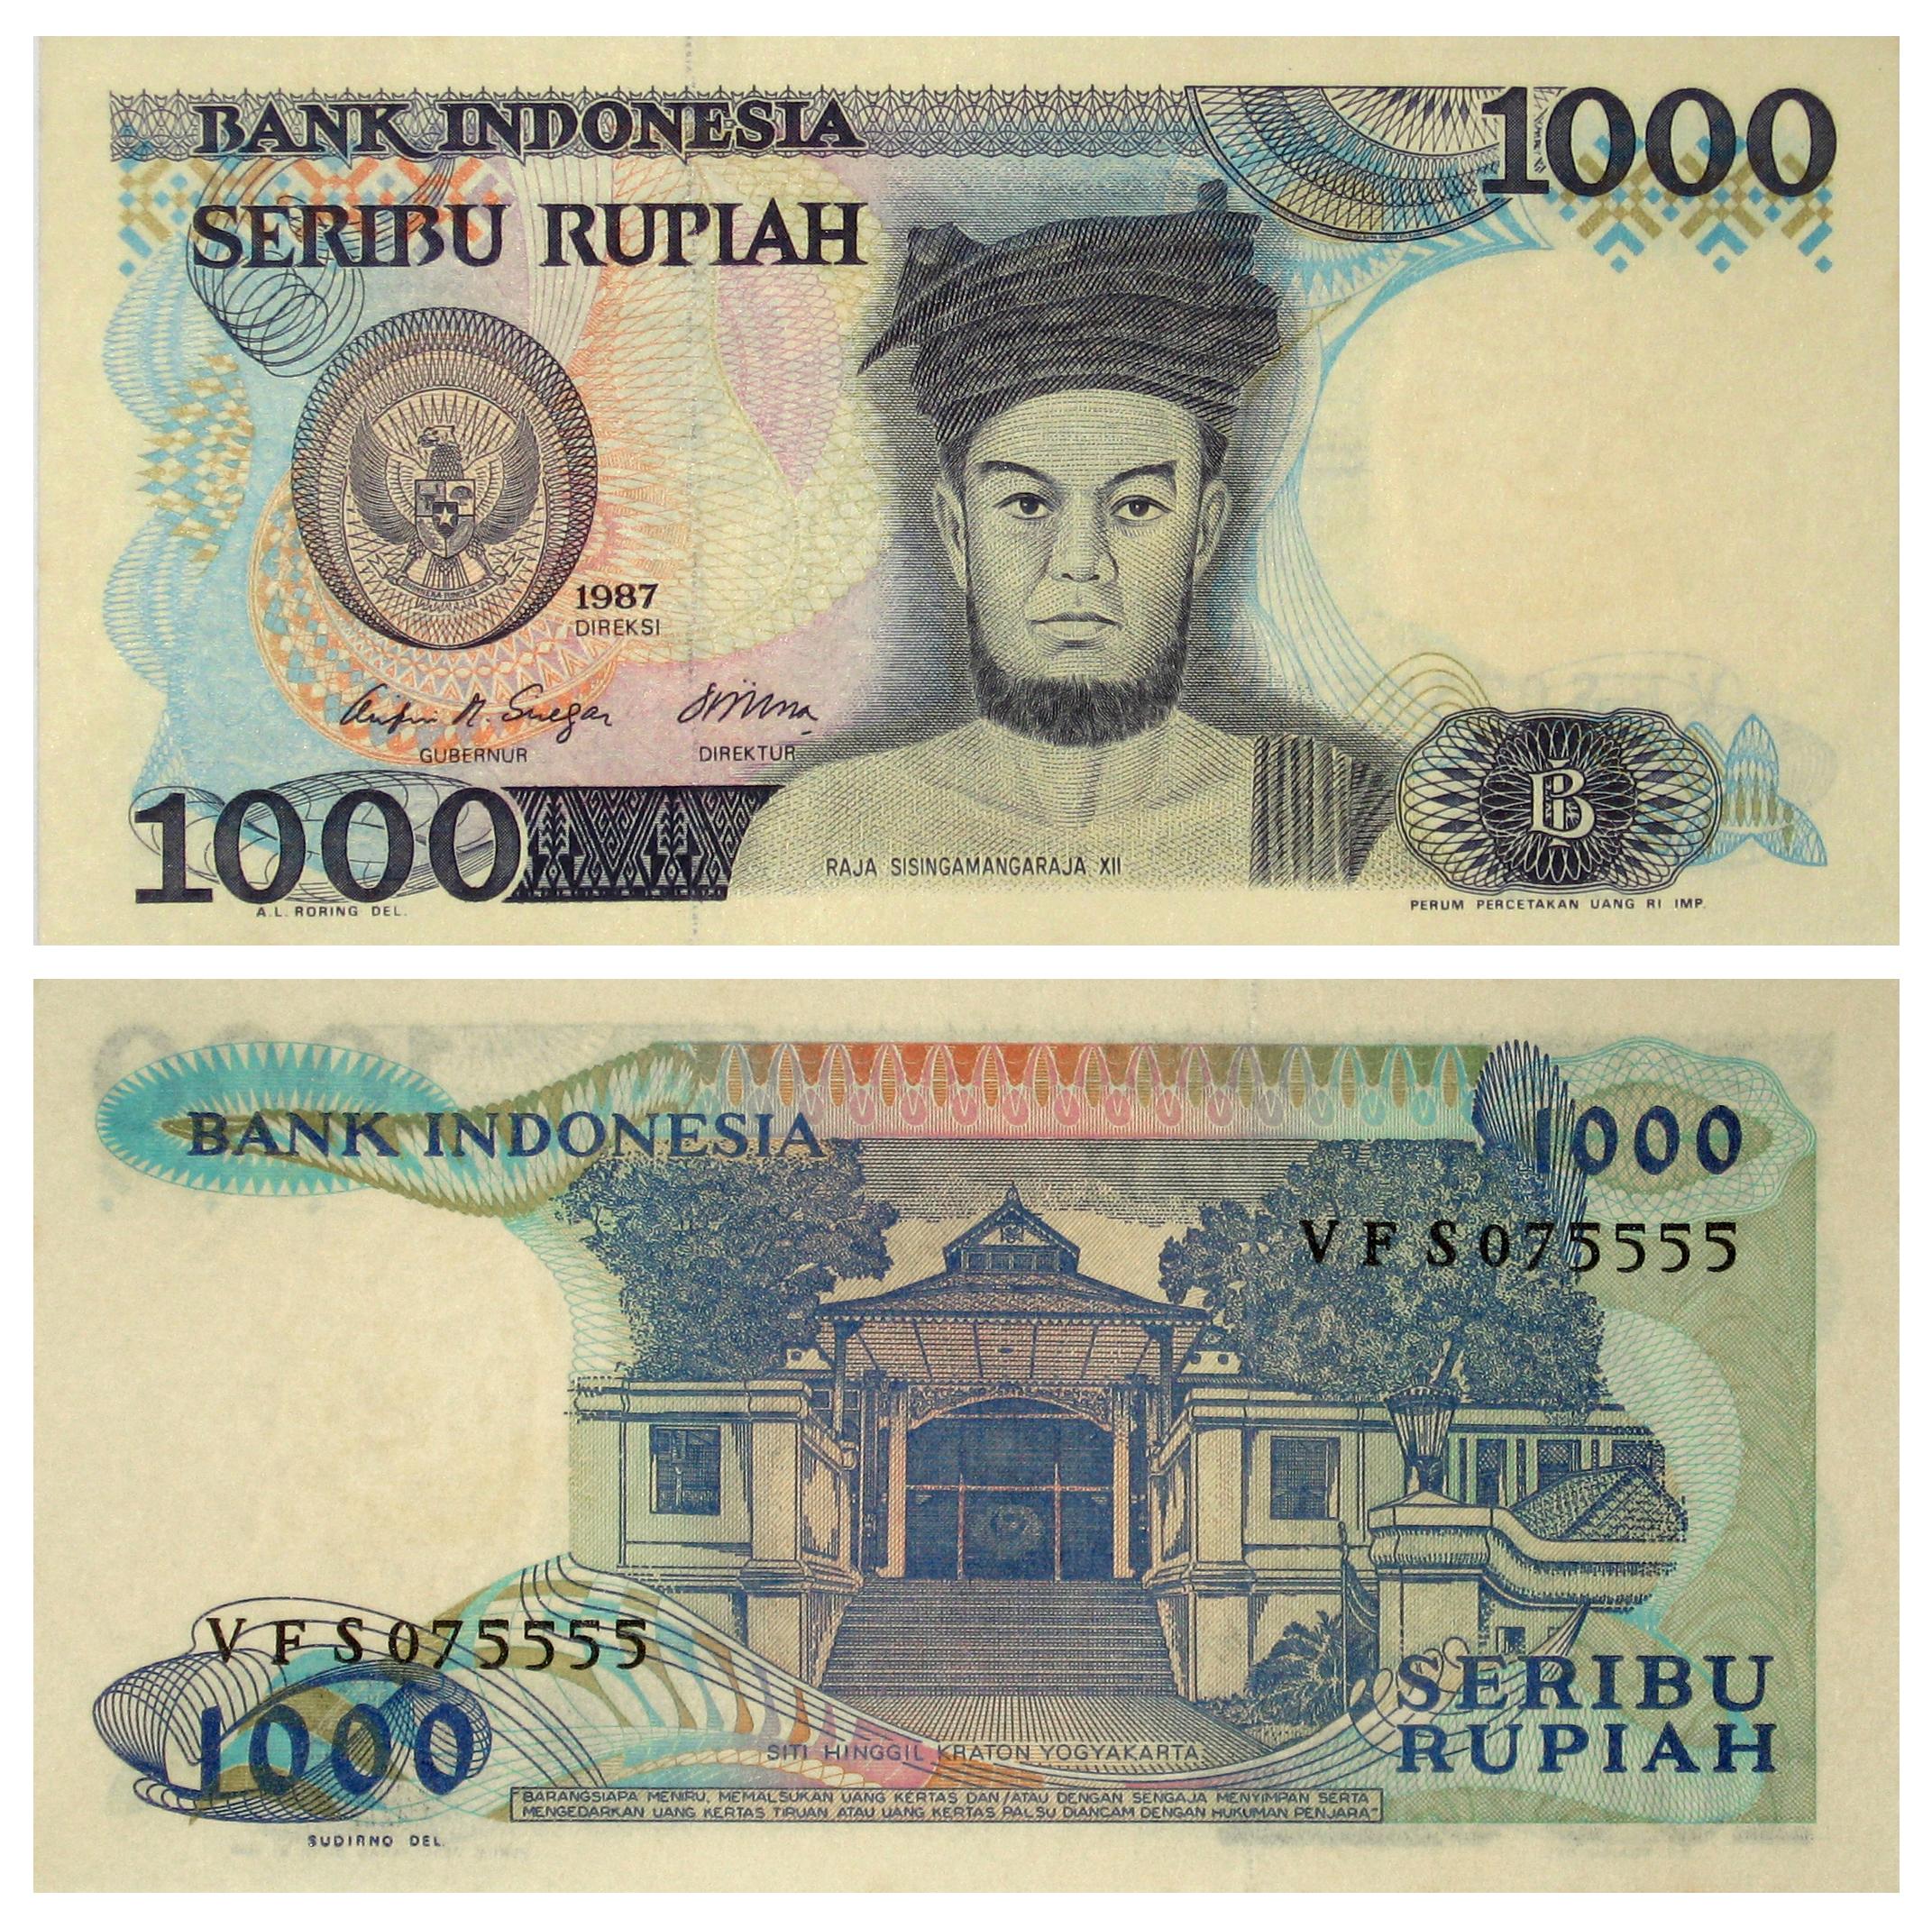 File 1987 Series 1000 Rupiah Note Obverse And Reverse Jpg